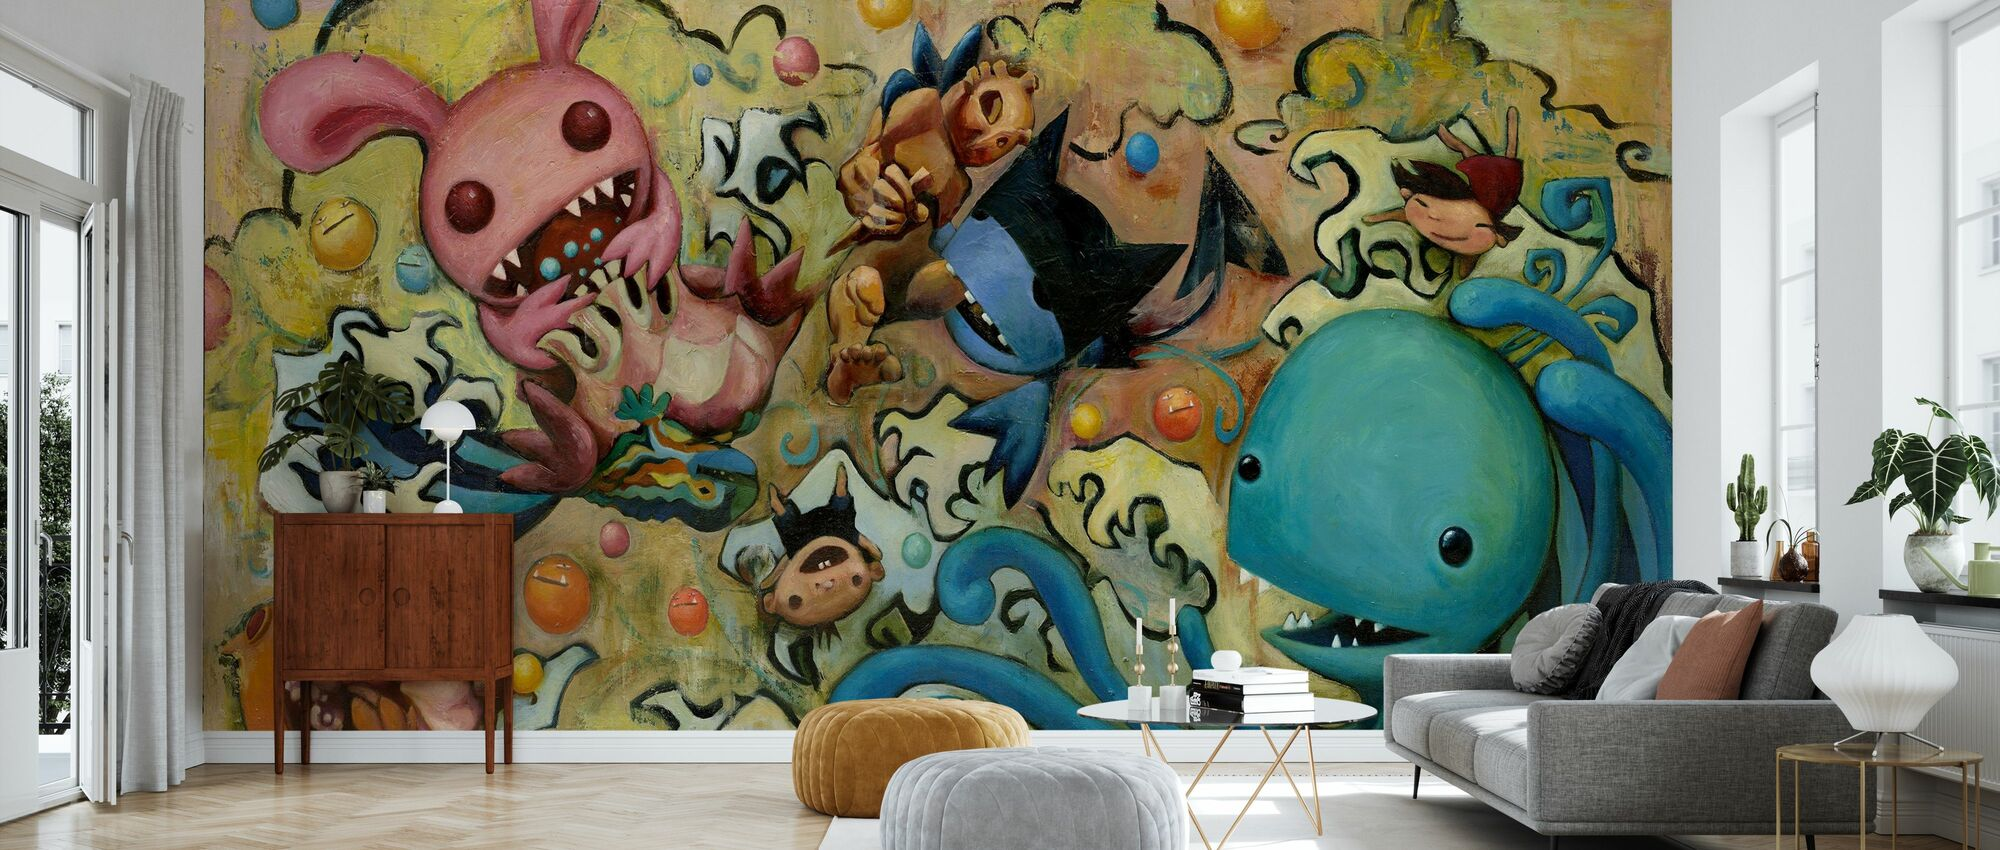 Mari Inukai - Espagneifuku - Papier peint - Salle à manger